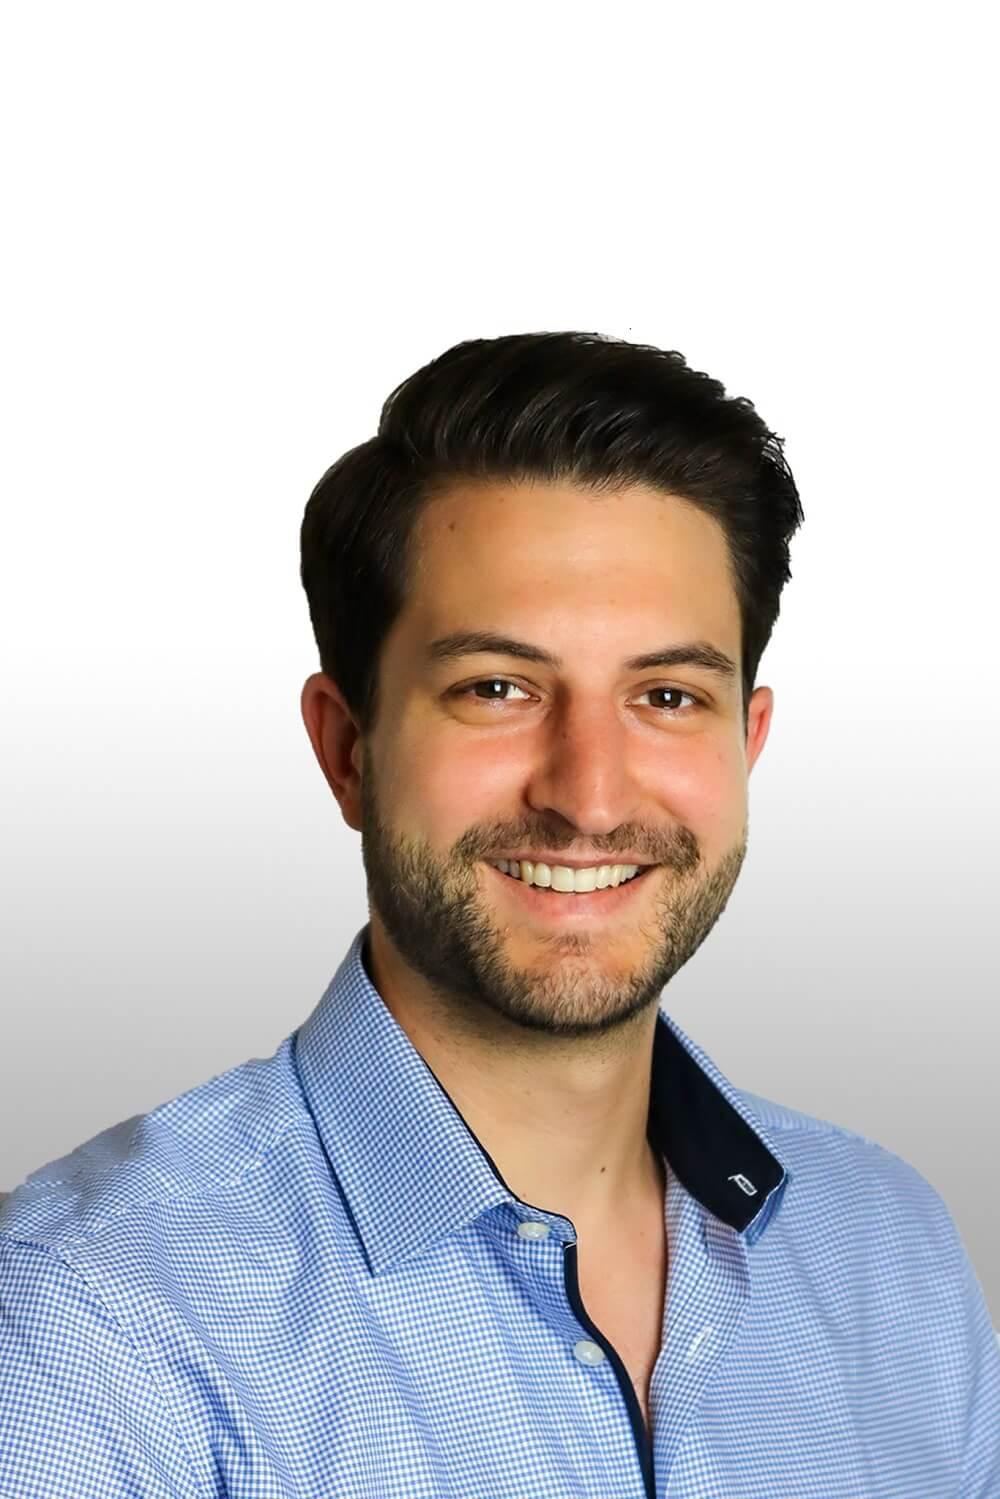 Darius Greulich